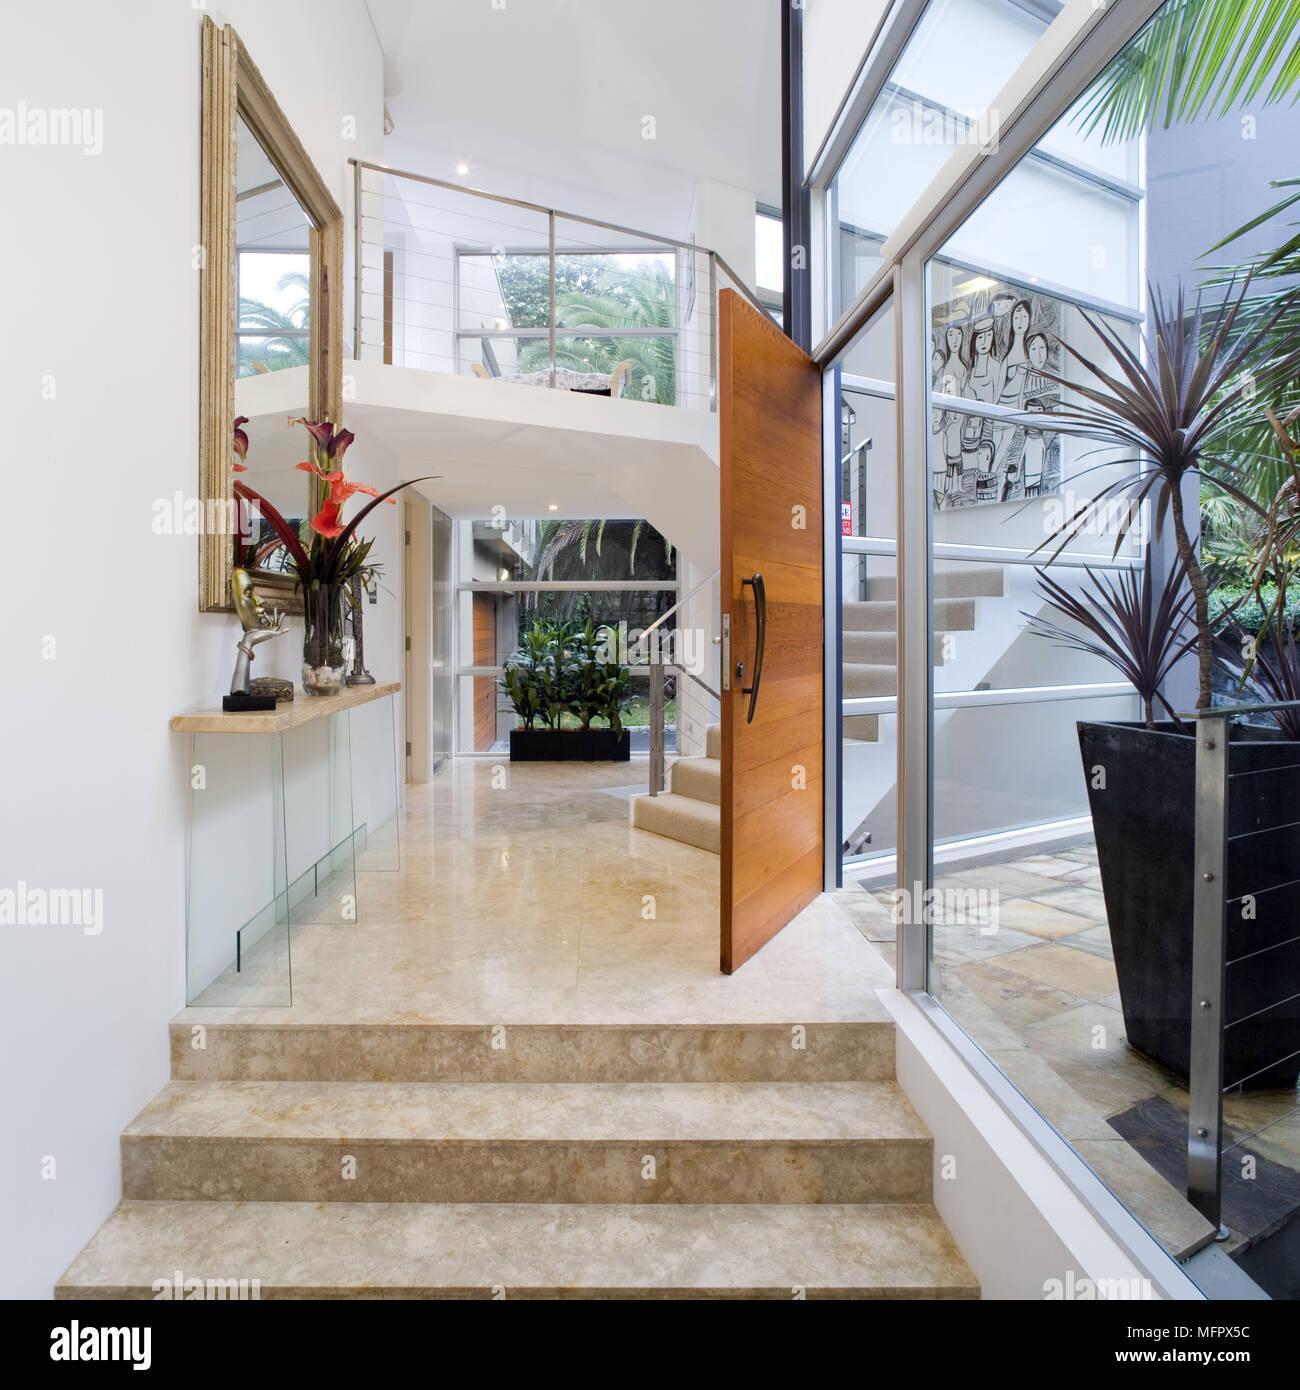 Modern Front Door Into Entrance Hallway With Marble Floor Stock Photo Alamy